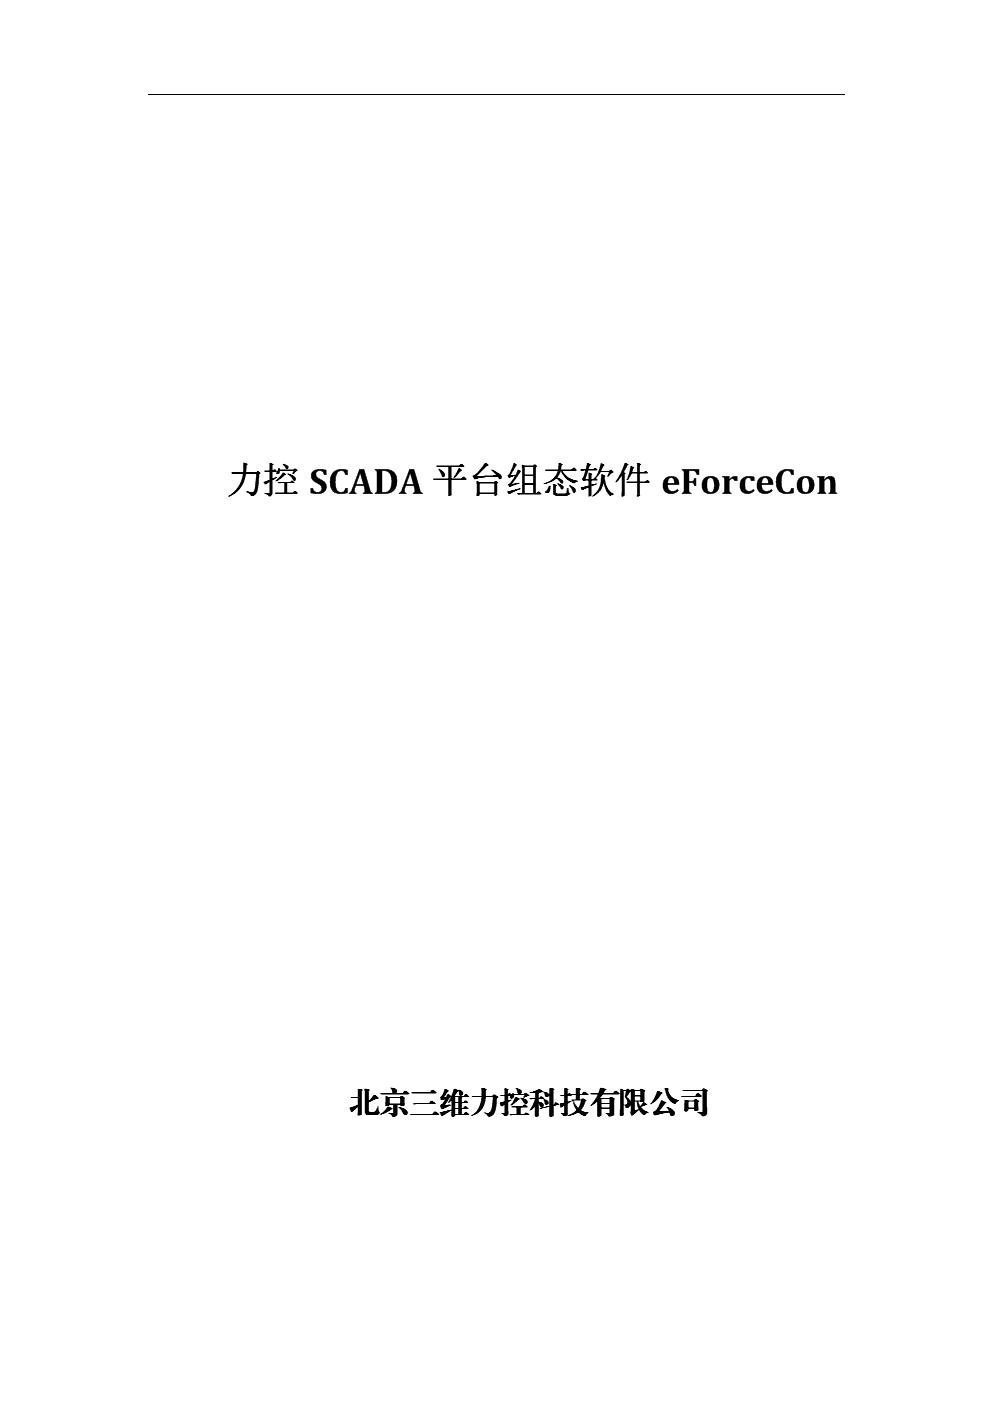 002-力控scada平台软件eForceCon产品白皮书.doc